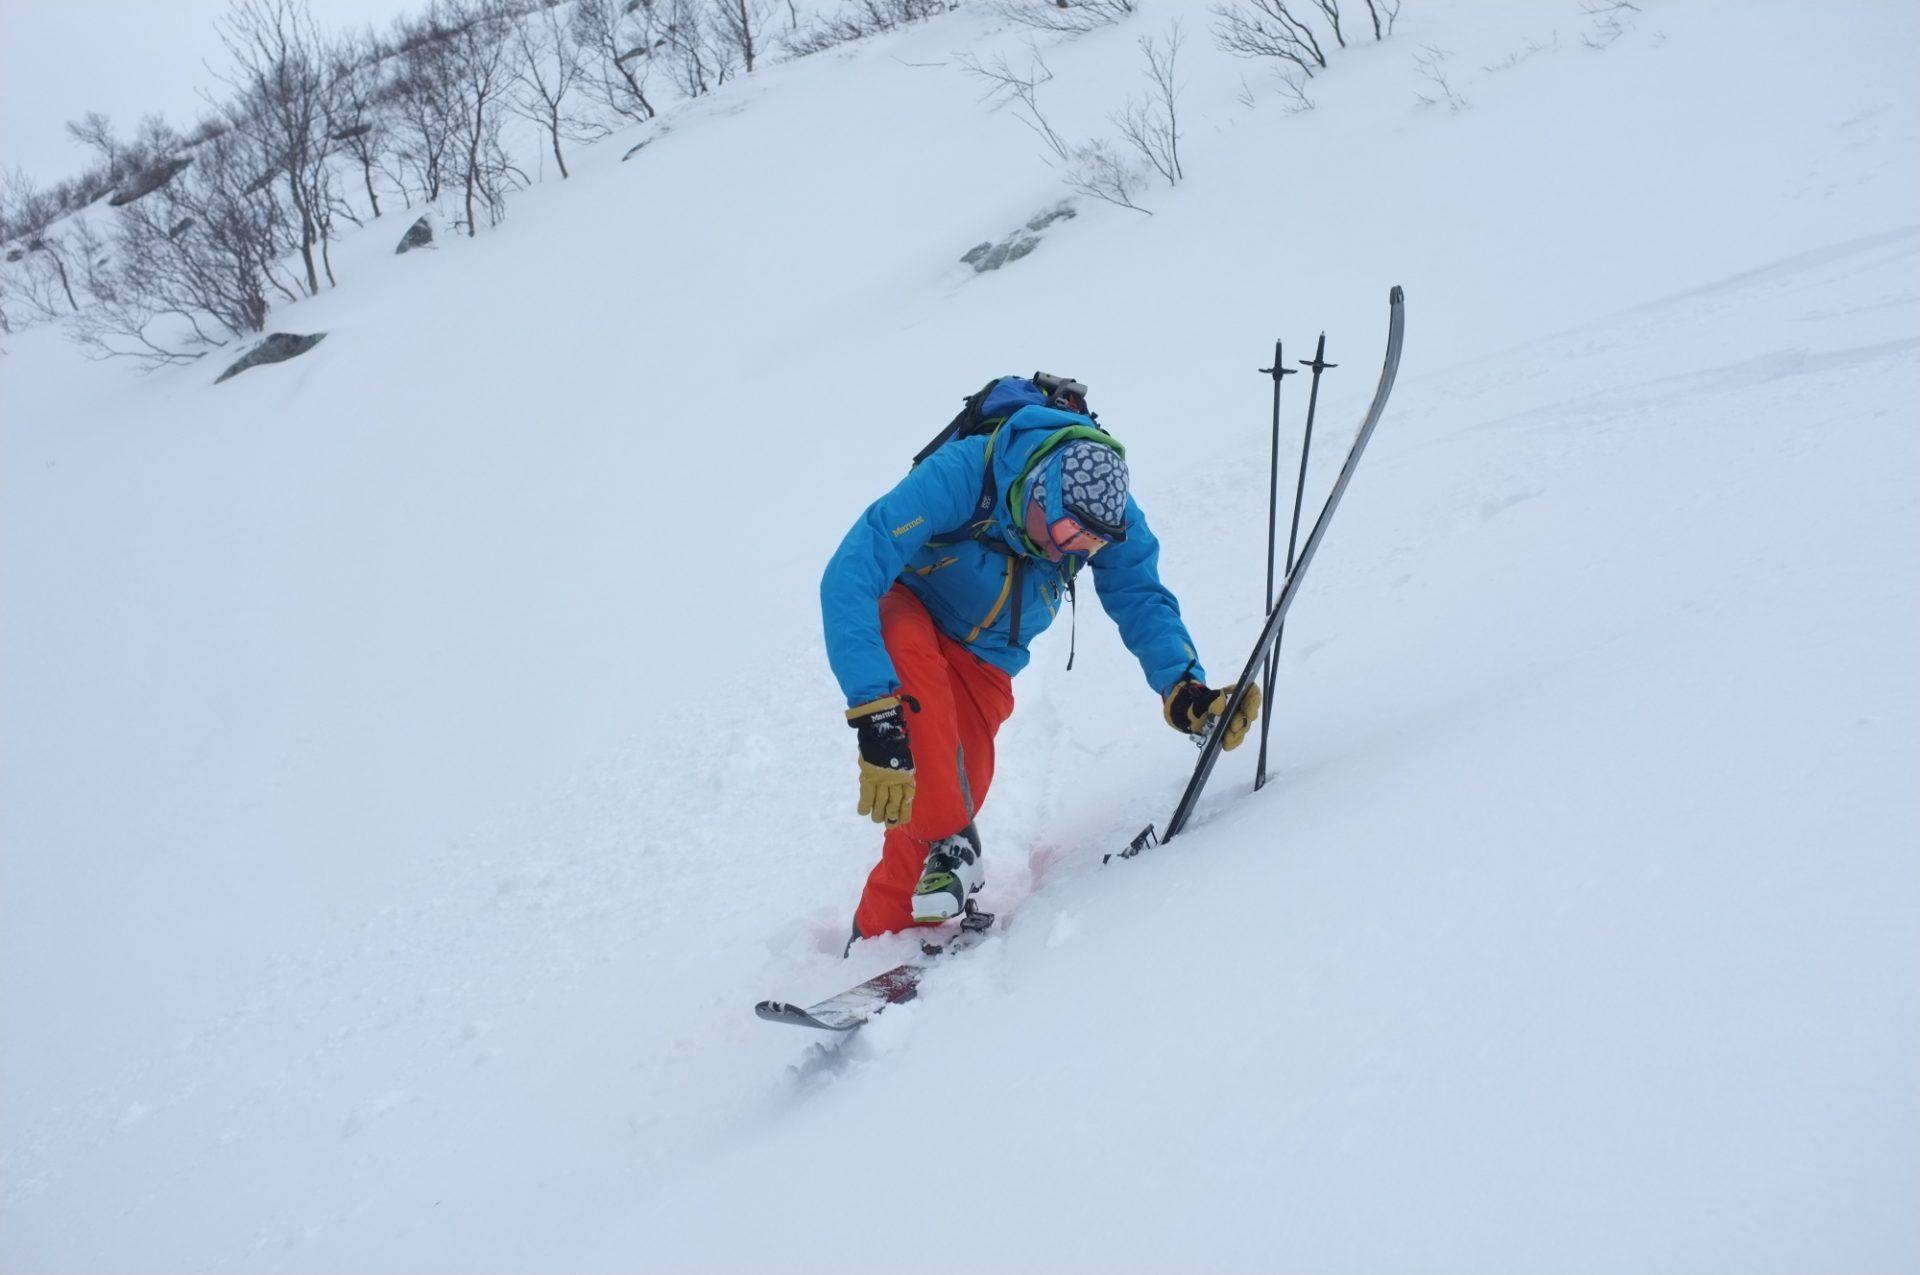 Bergsteigertipp Ski anziehen 2 I (c) Peter Plattner